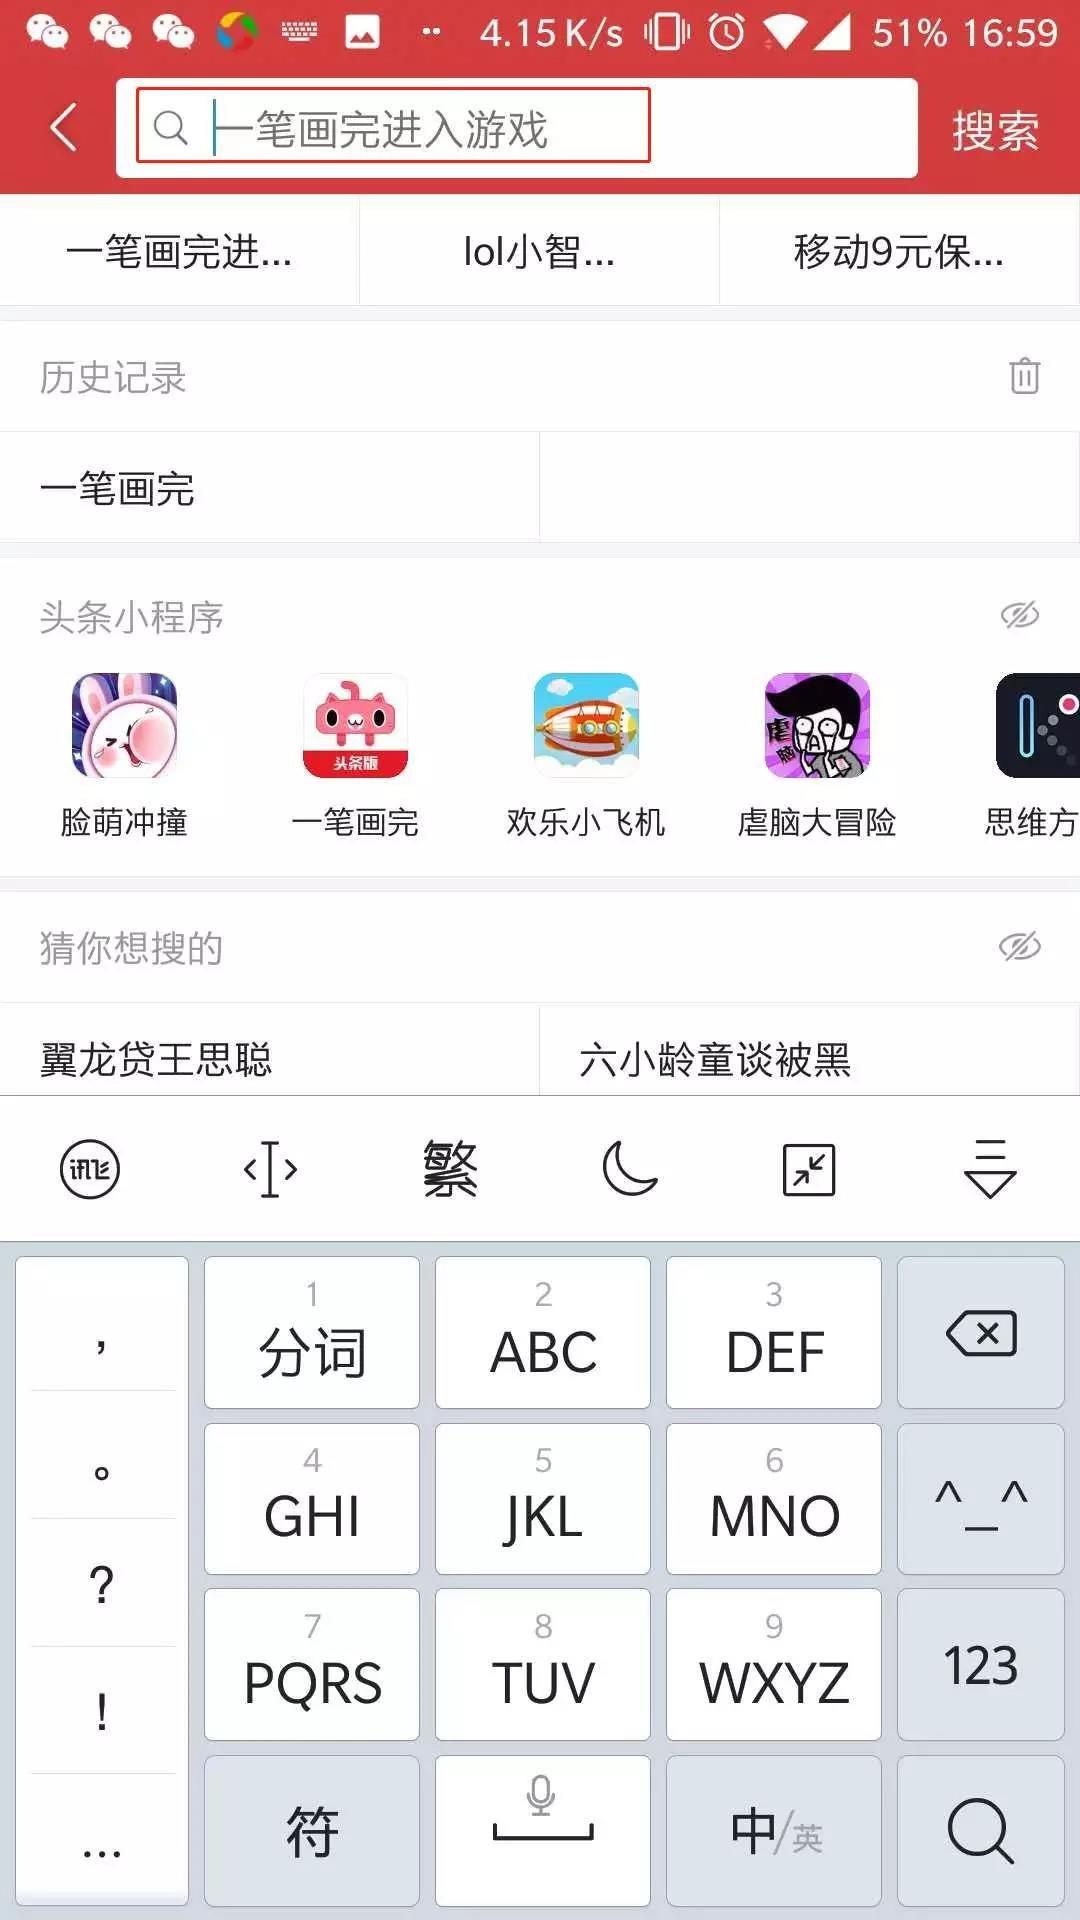 <a href='http://mcnjigou.com/?tags=3'>抖音</a>首款小游戏上线 流量、分成及接入指南!